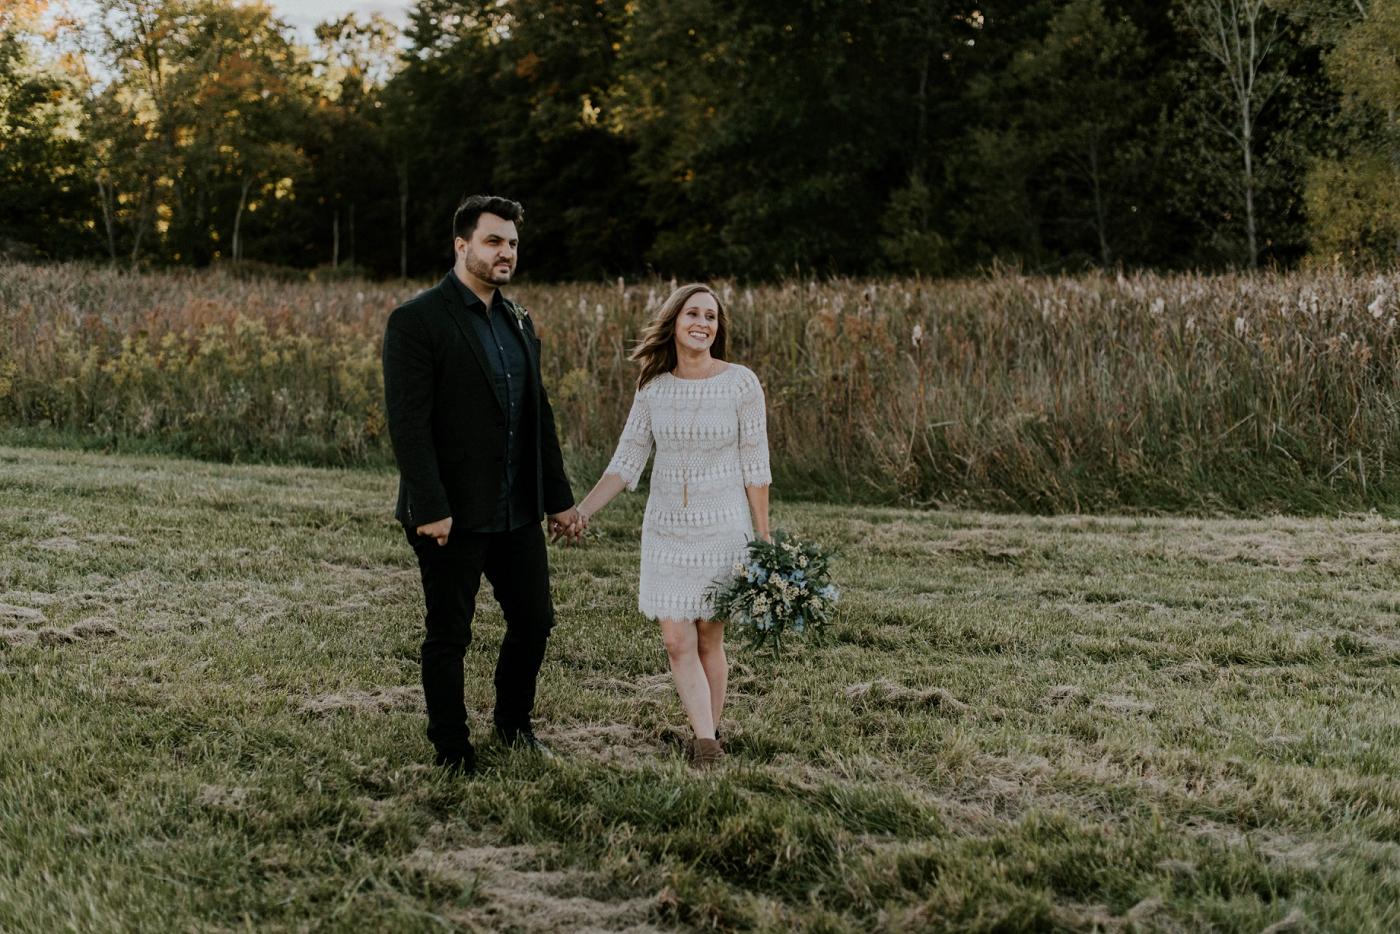 Wildflower-Field-Elopement-Vow-Renewal_Lisa+Chad_MJPHOTO-5.JPG